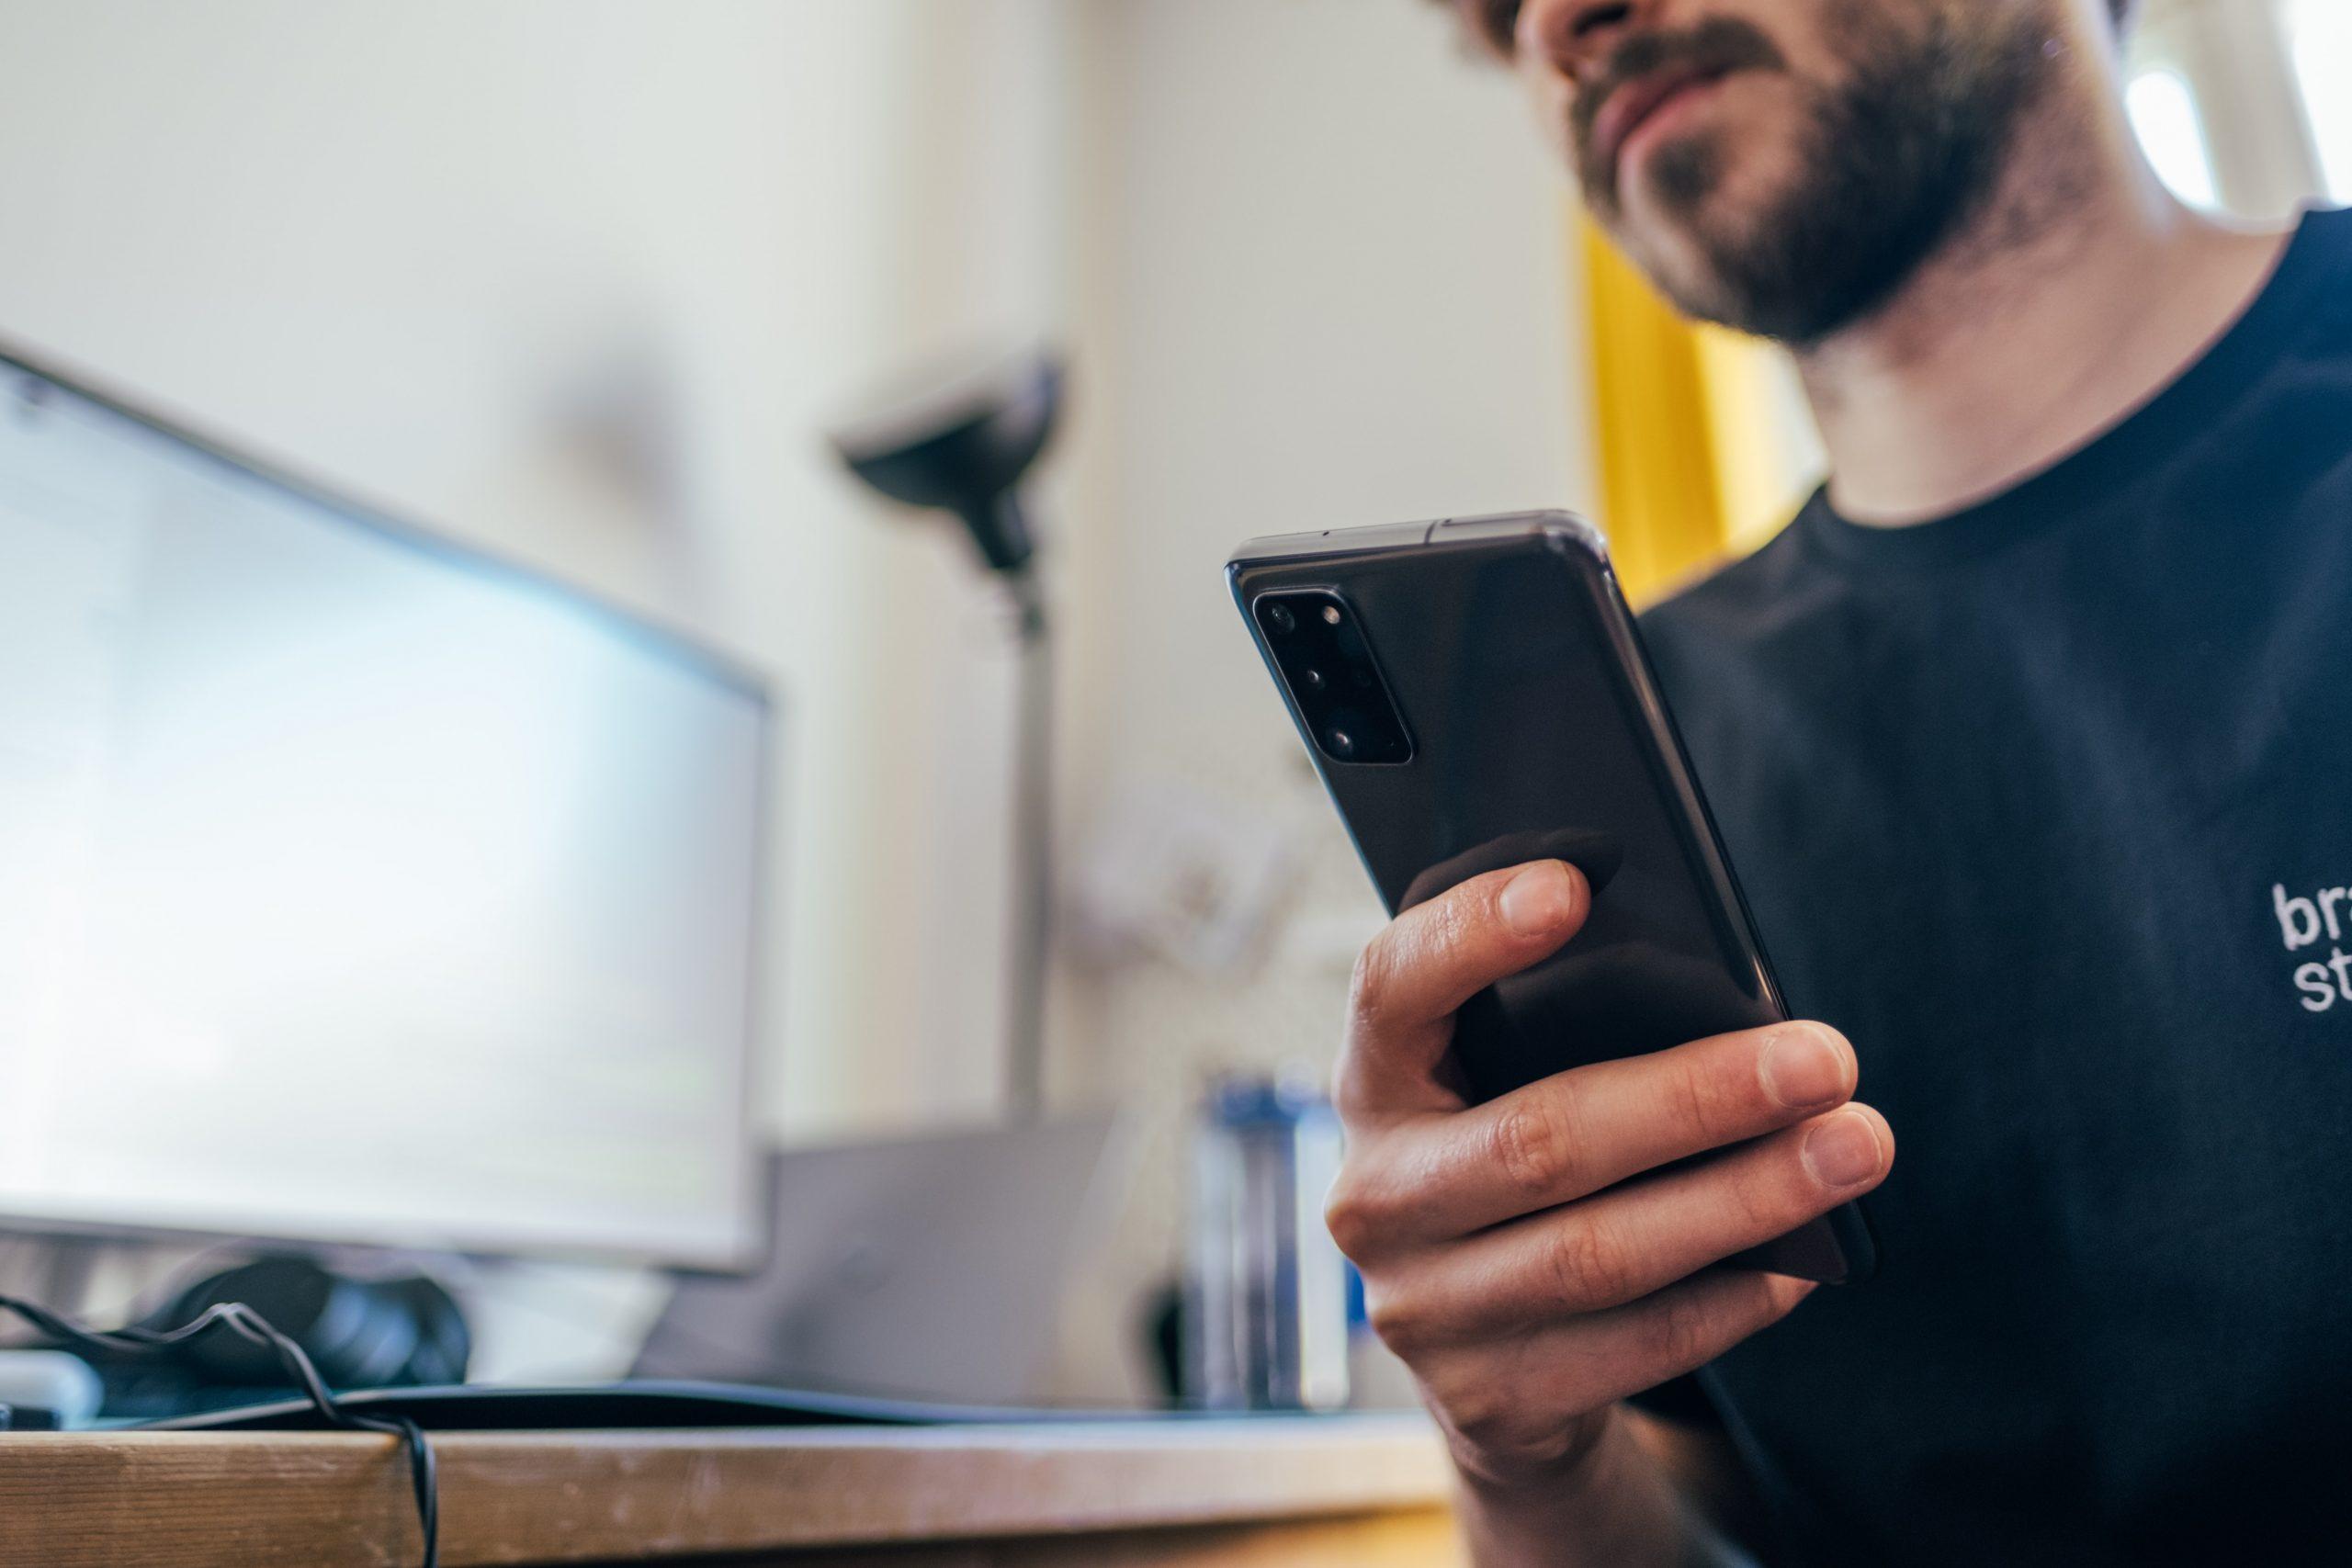 man holding a samsung phone